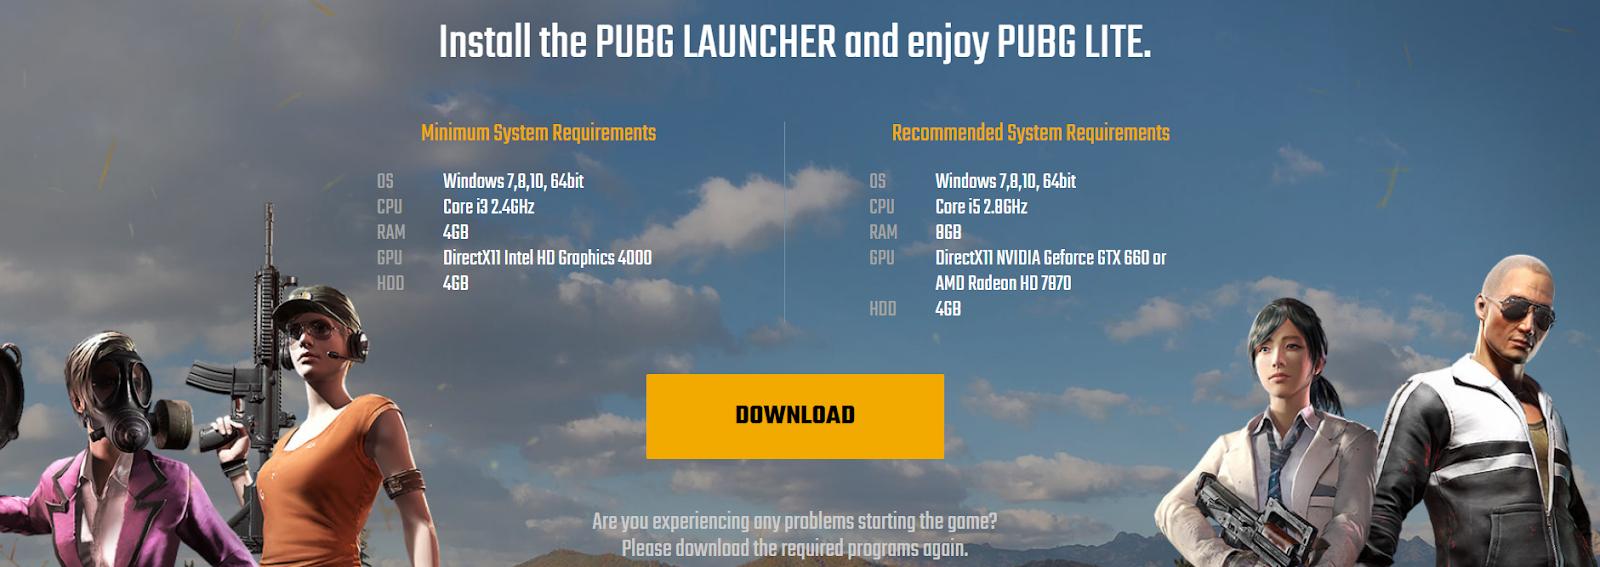 Install Pubg Launcher